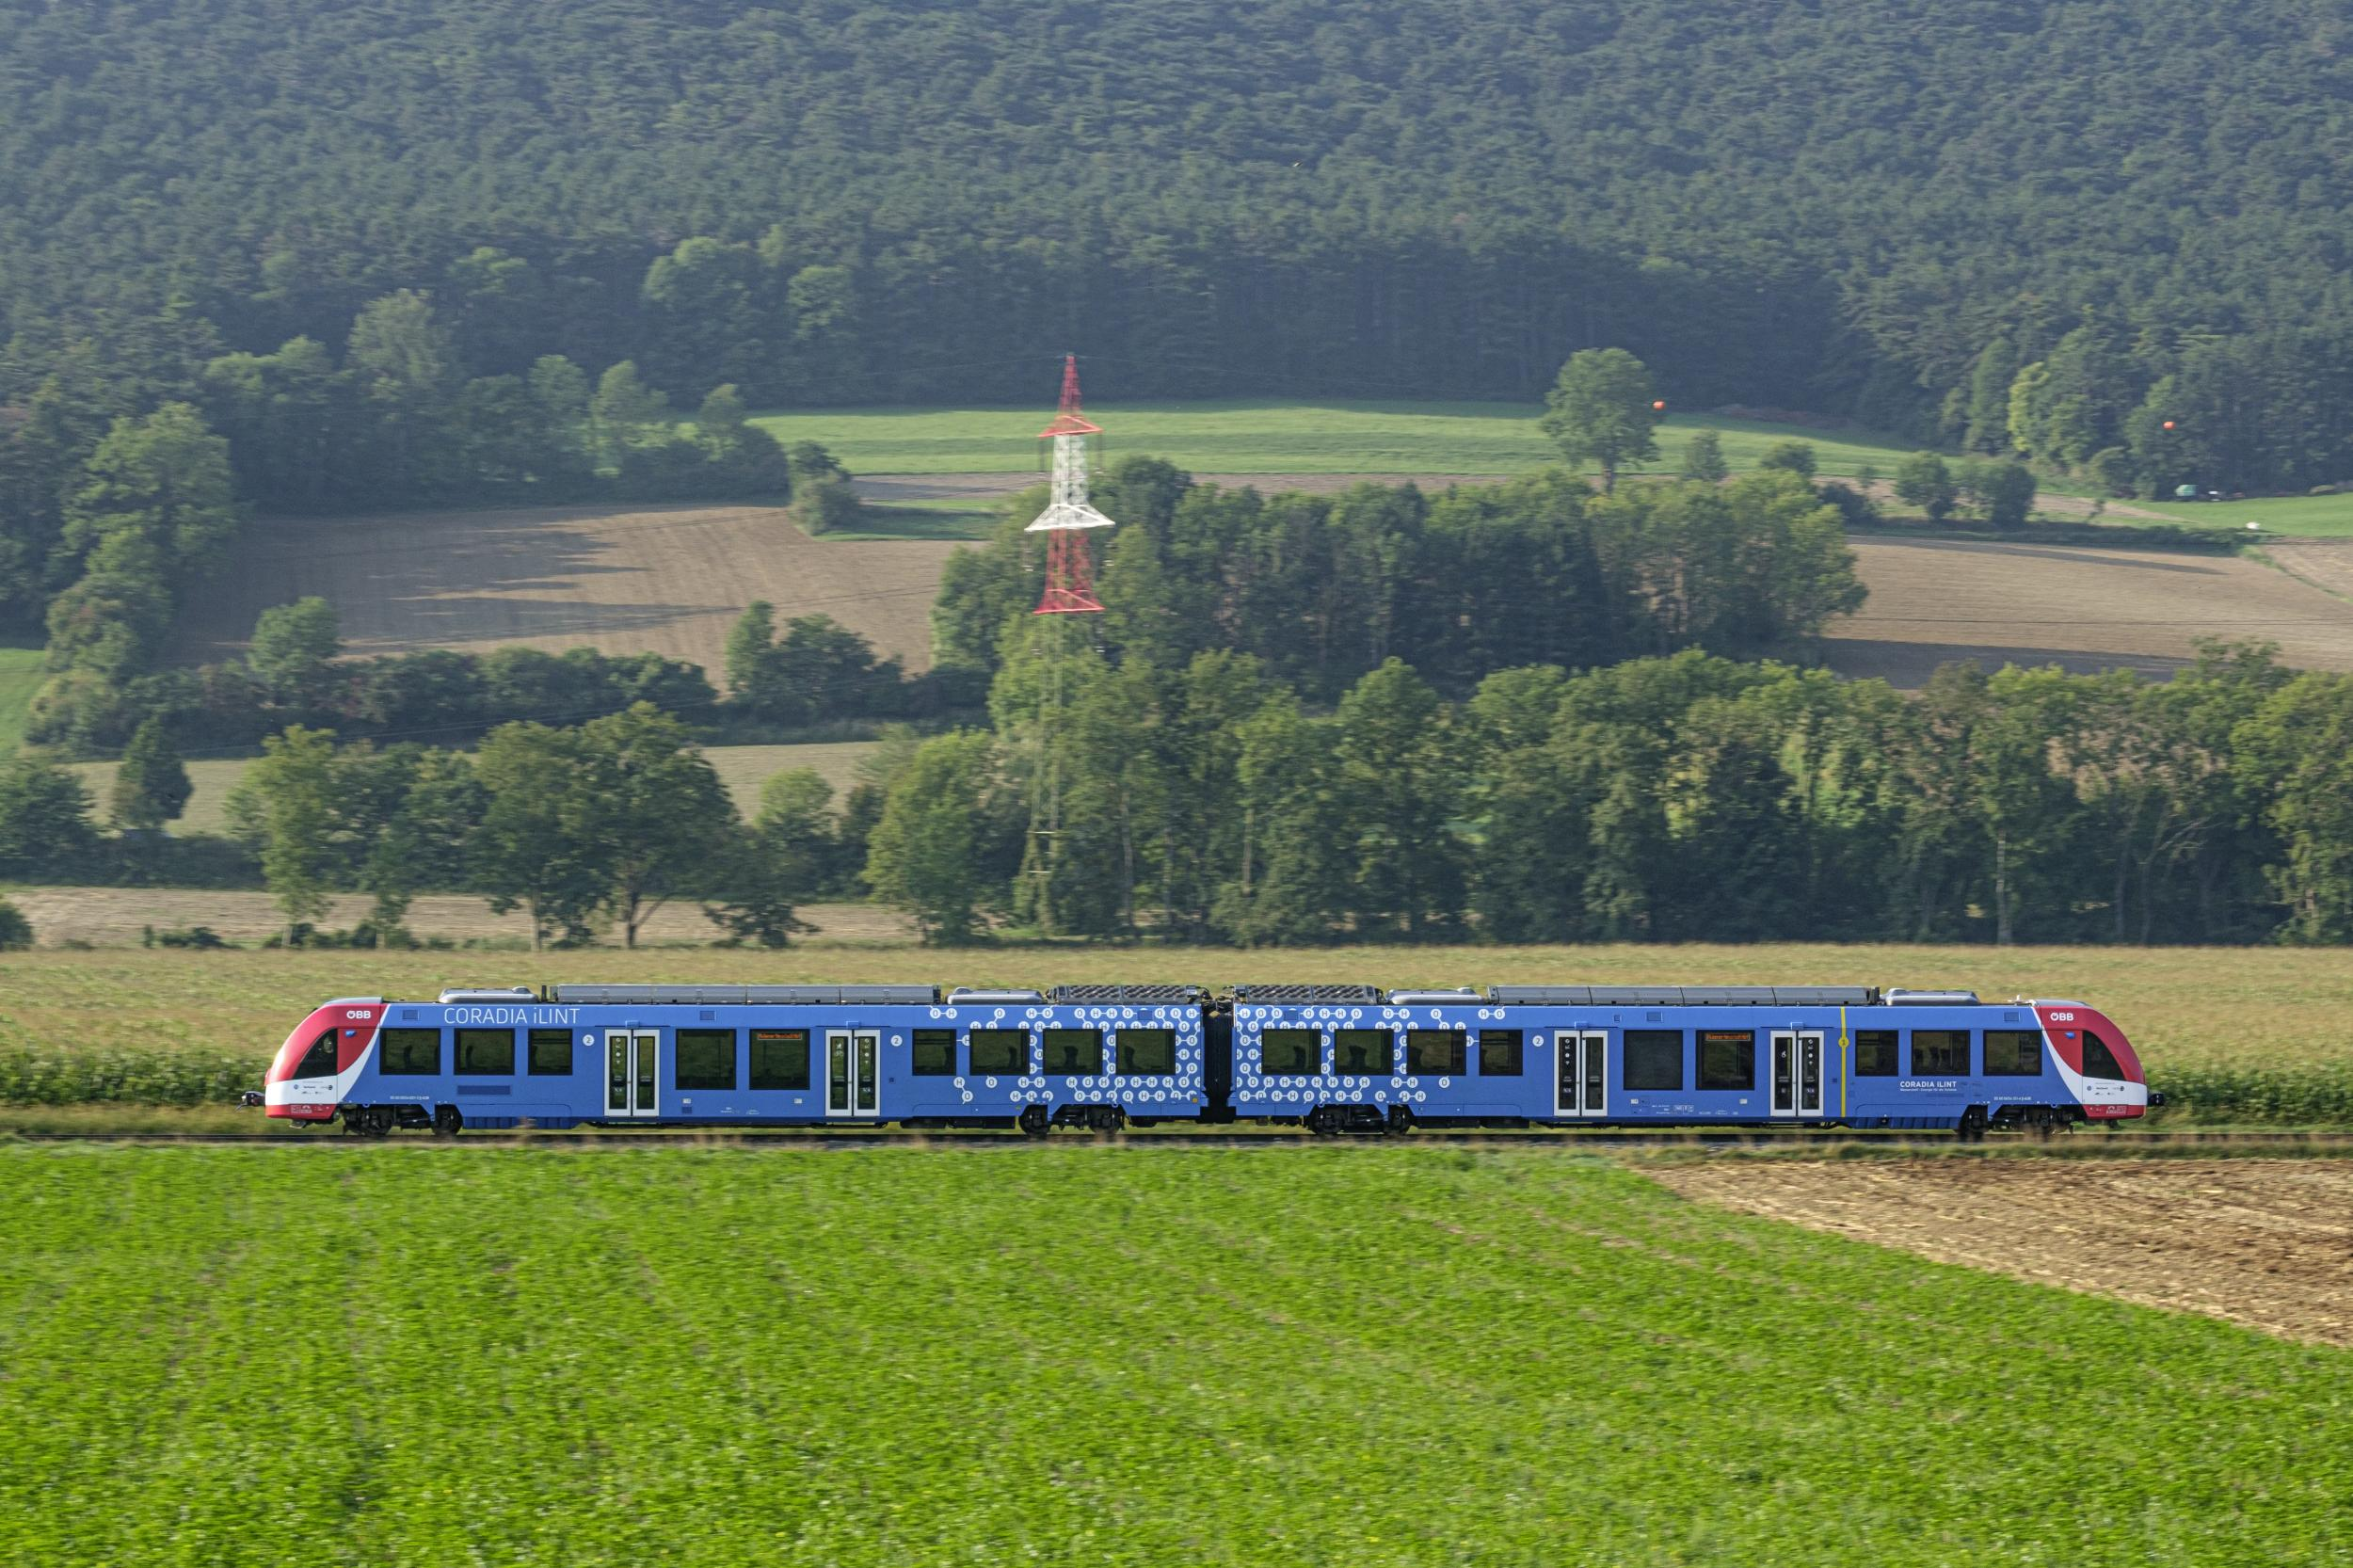 The Coradia iLint hydrogen train by Alstom